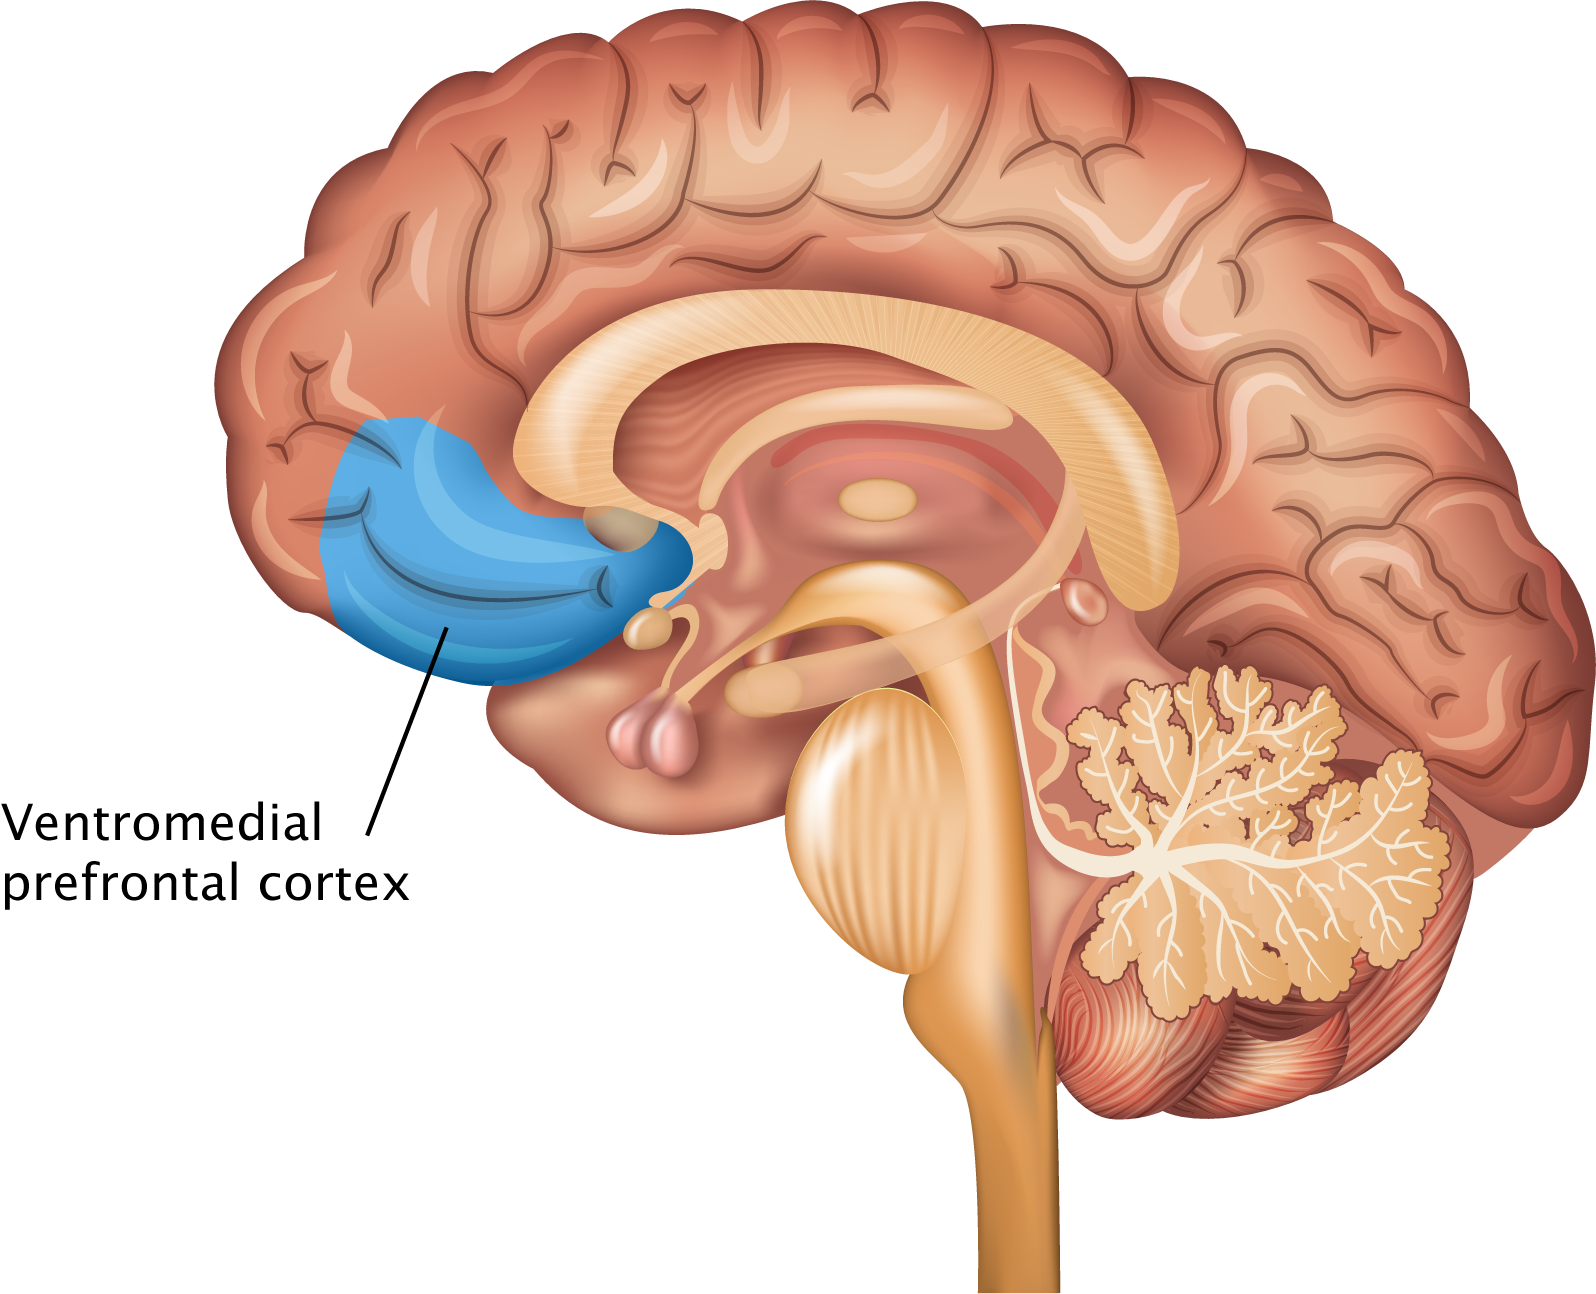 prefrontal cortex සඳහා පින්තුර ප්රතිඵල